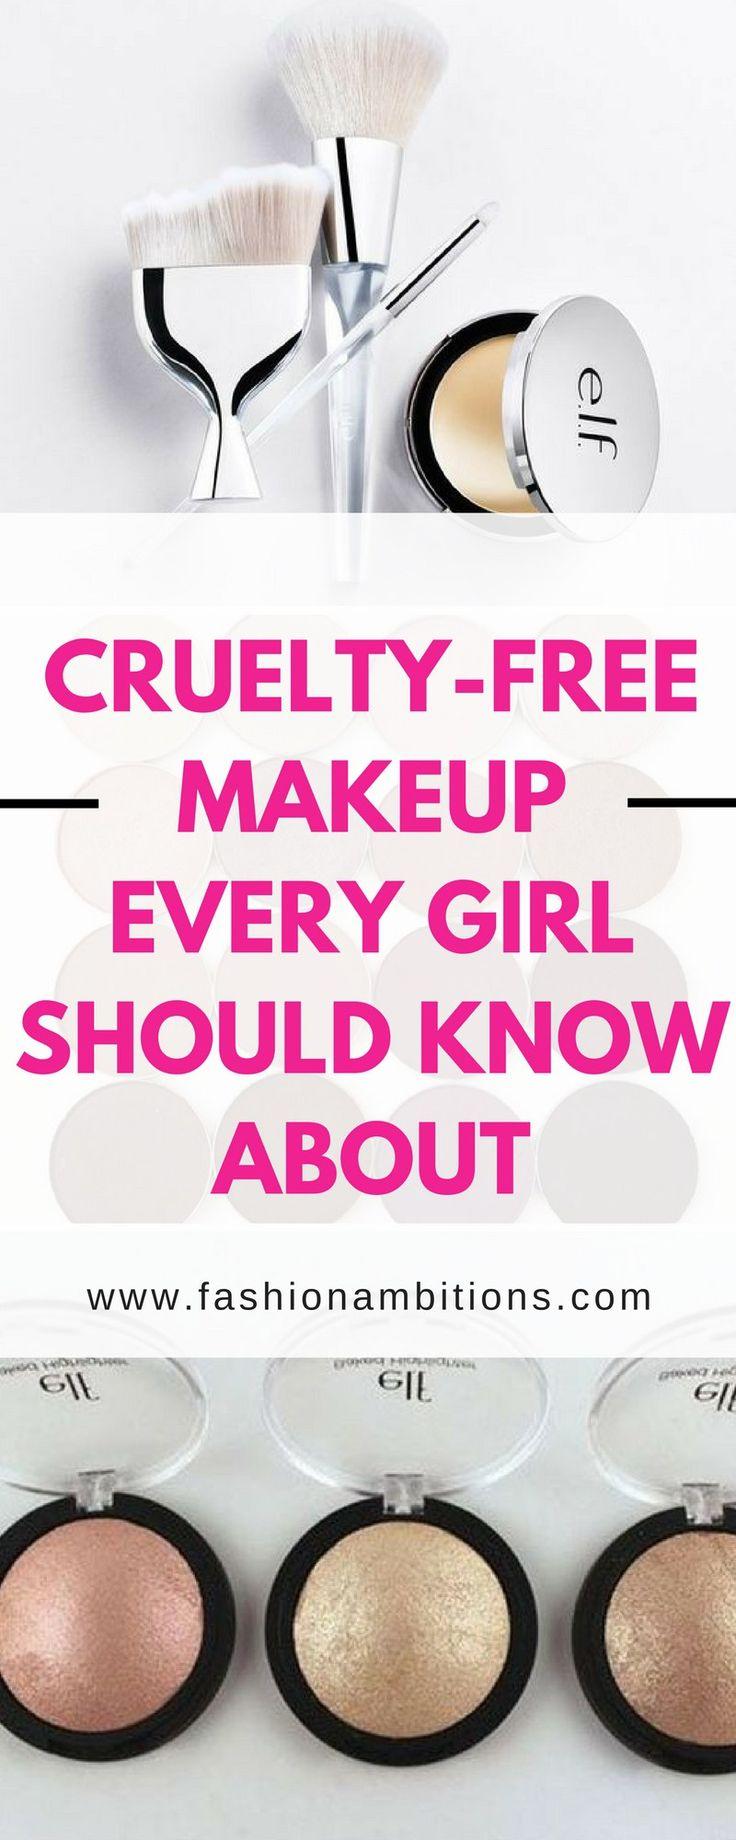 Cruelty Free Fashion Runways Cruelty Free Fashion: 25+ Best Ideas About Cruelty Free Makeup On Pinterest